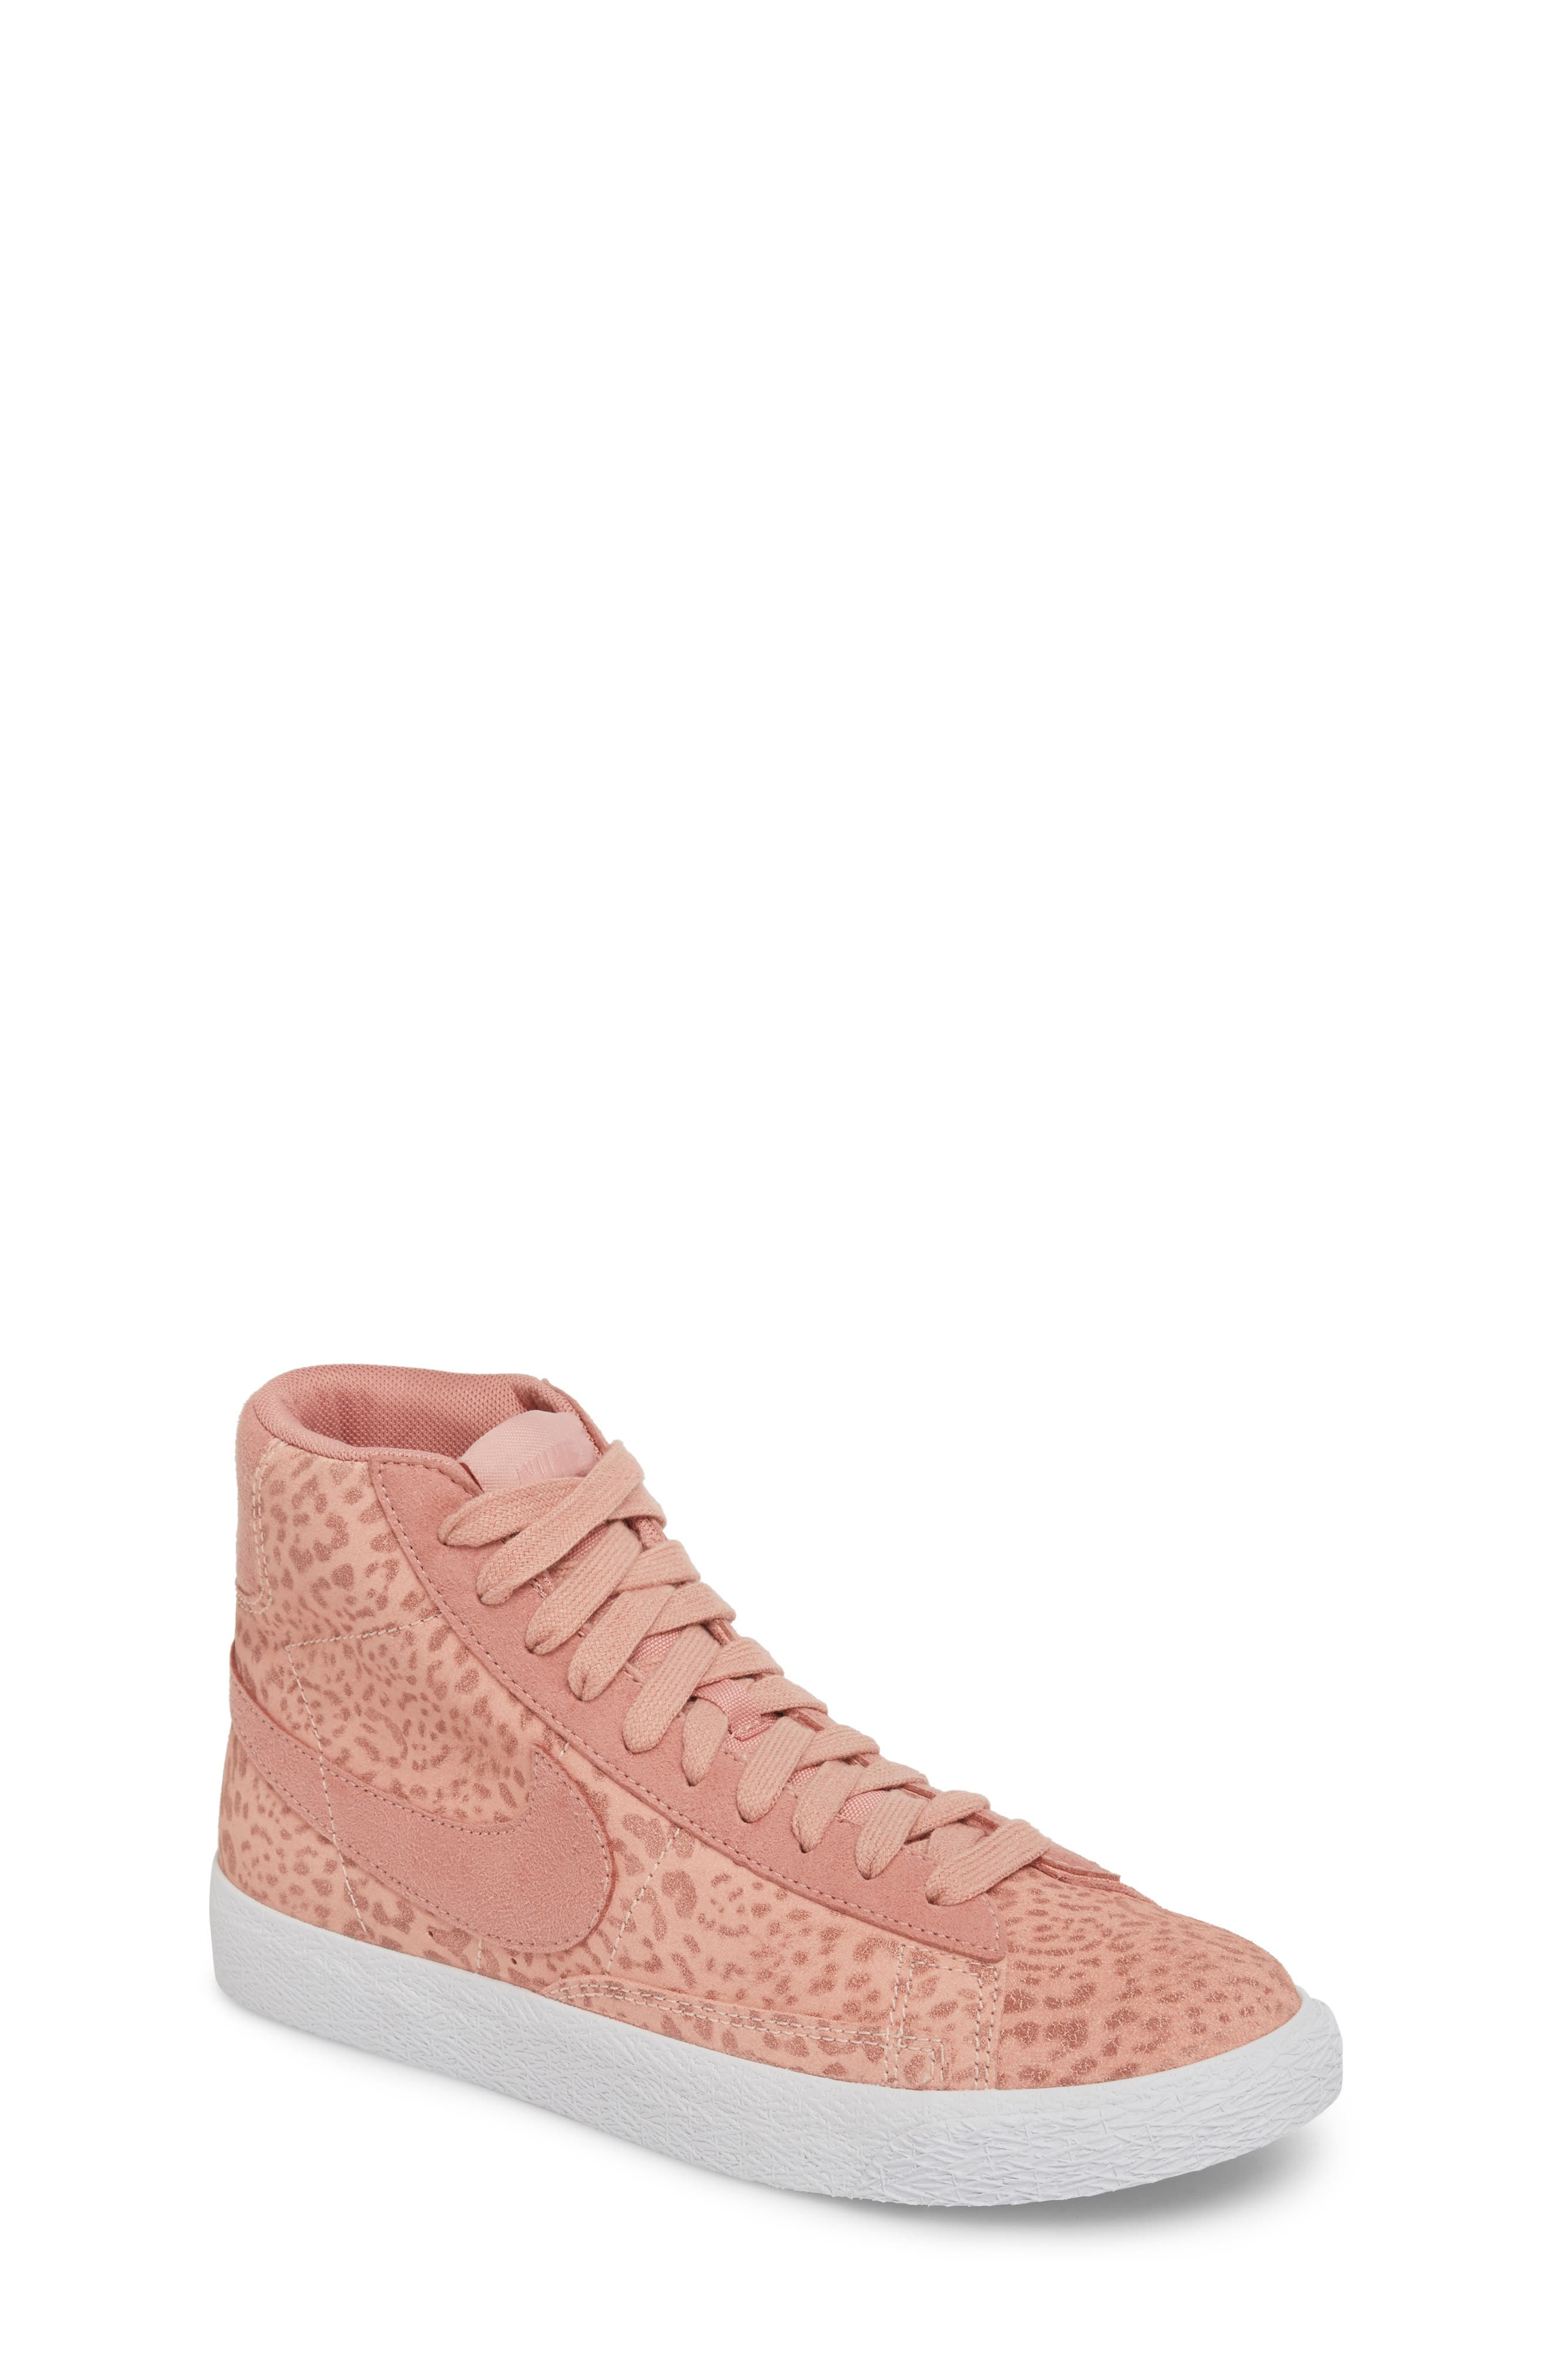 Blazer Mid SE High Top Sneaker,                             Main thumbnail 2, color,